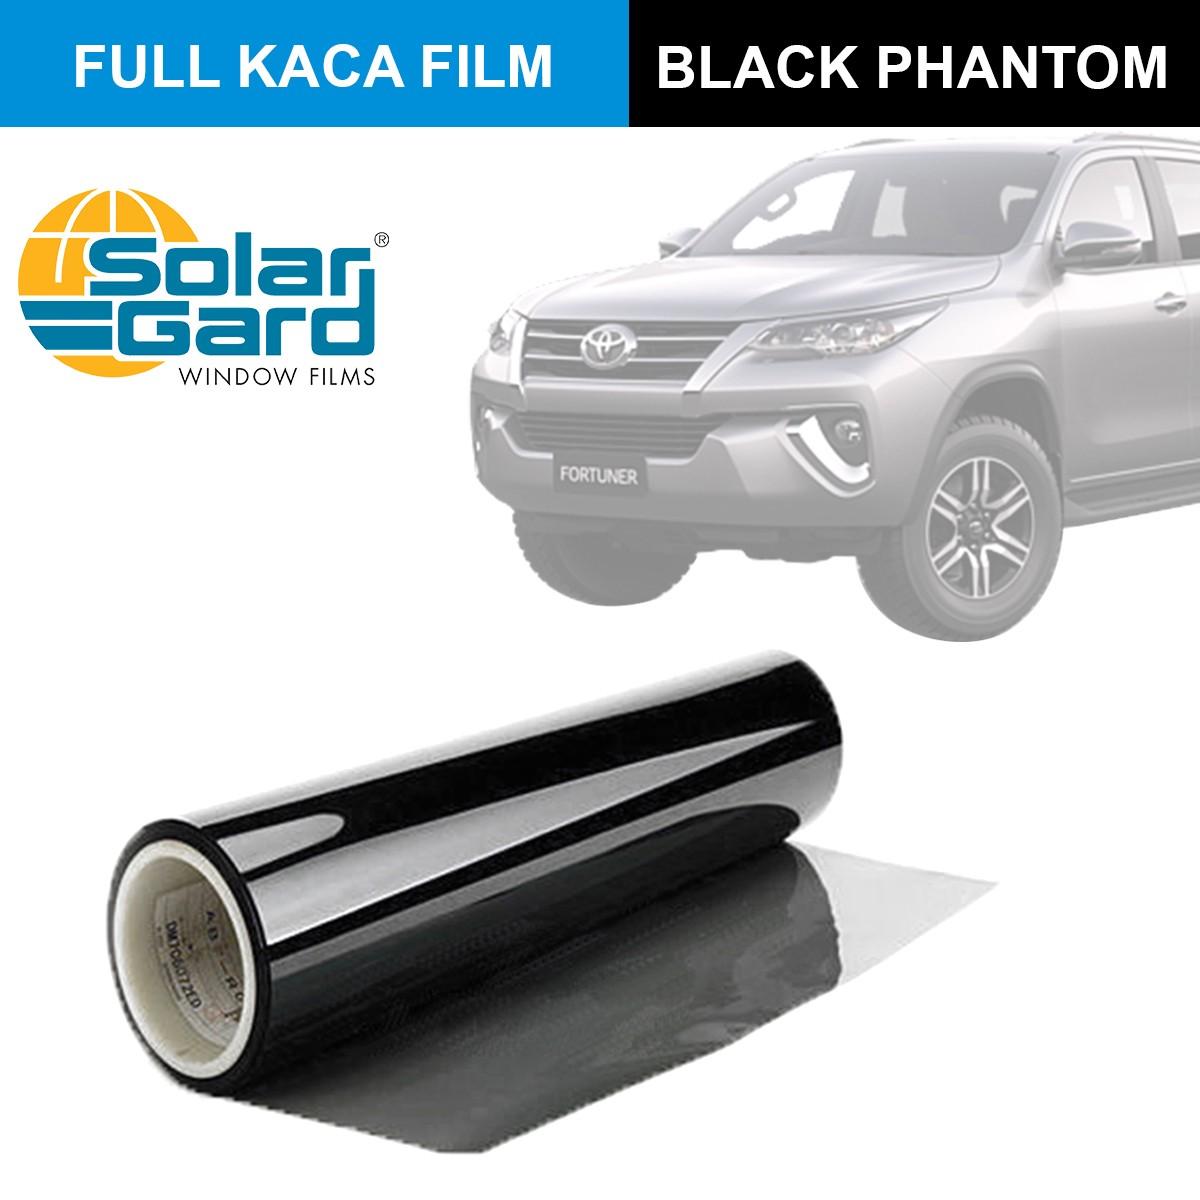 KACA FILM SOLAR GARD BLACK PHANTOM - (LARGE CAR) FULL KACA